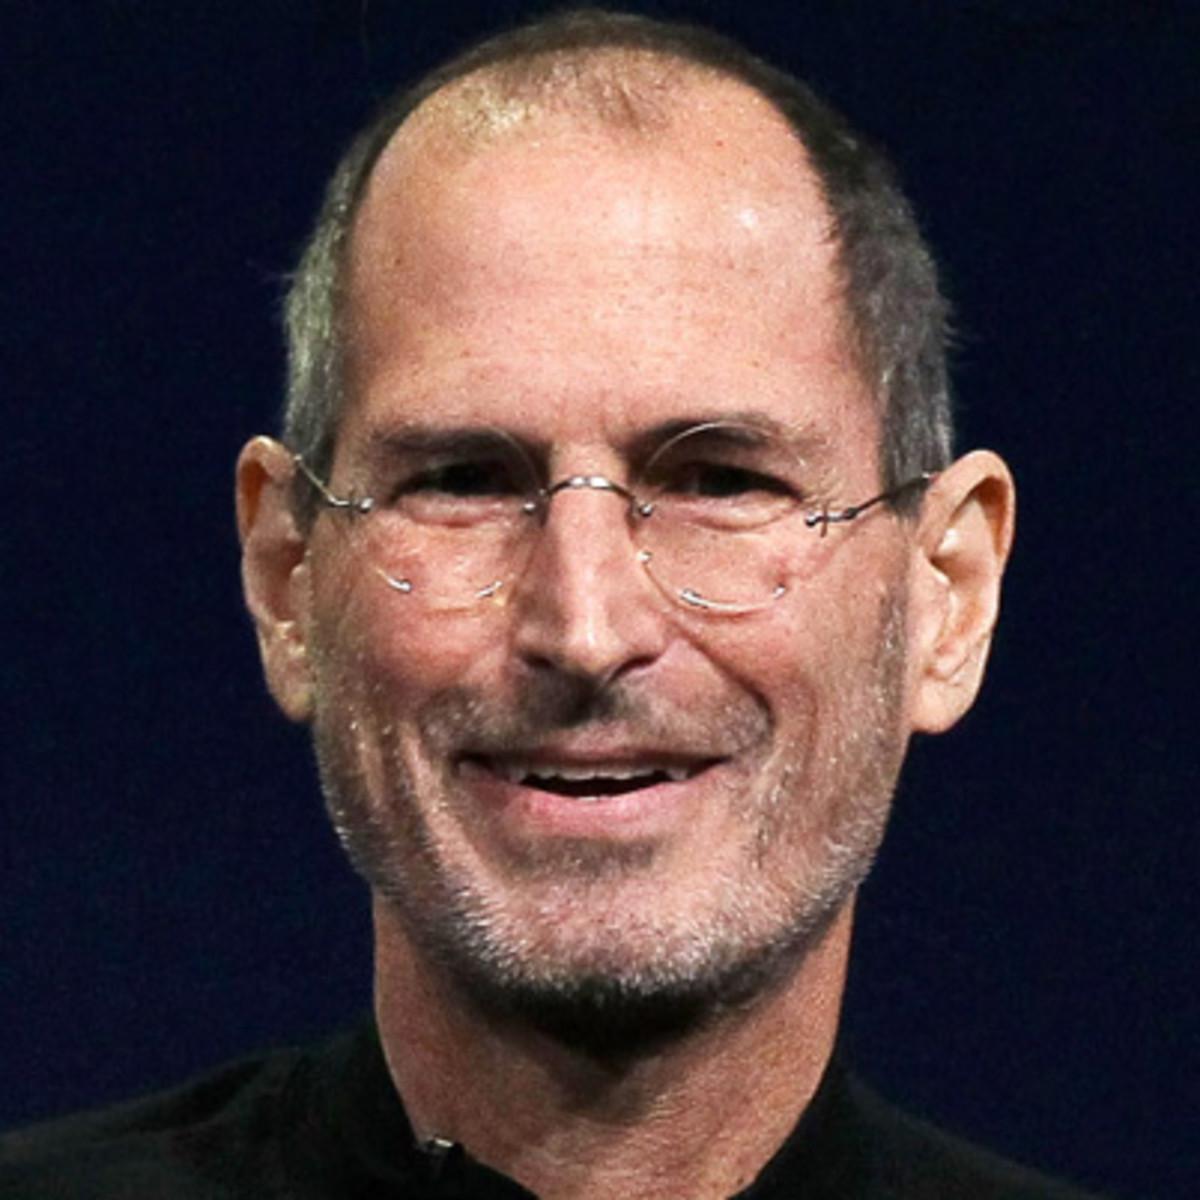 Steven Jobs. source: en-wikipedia.com